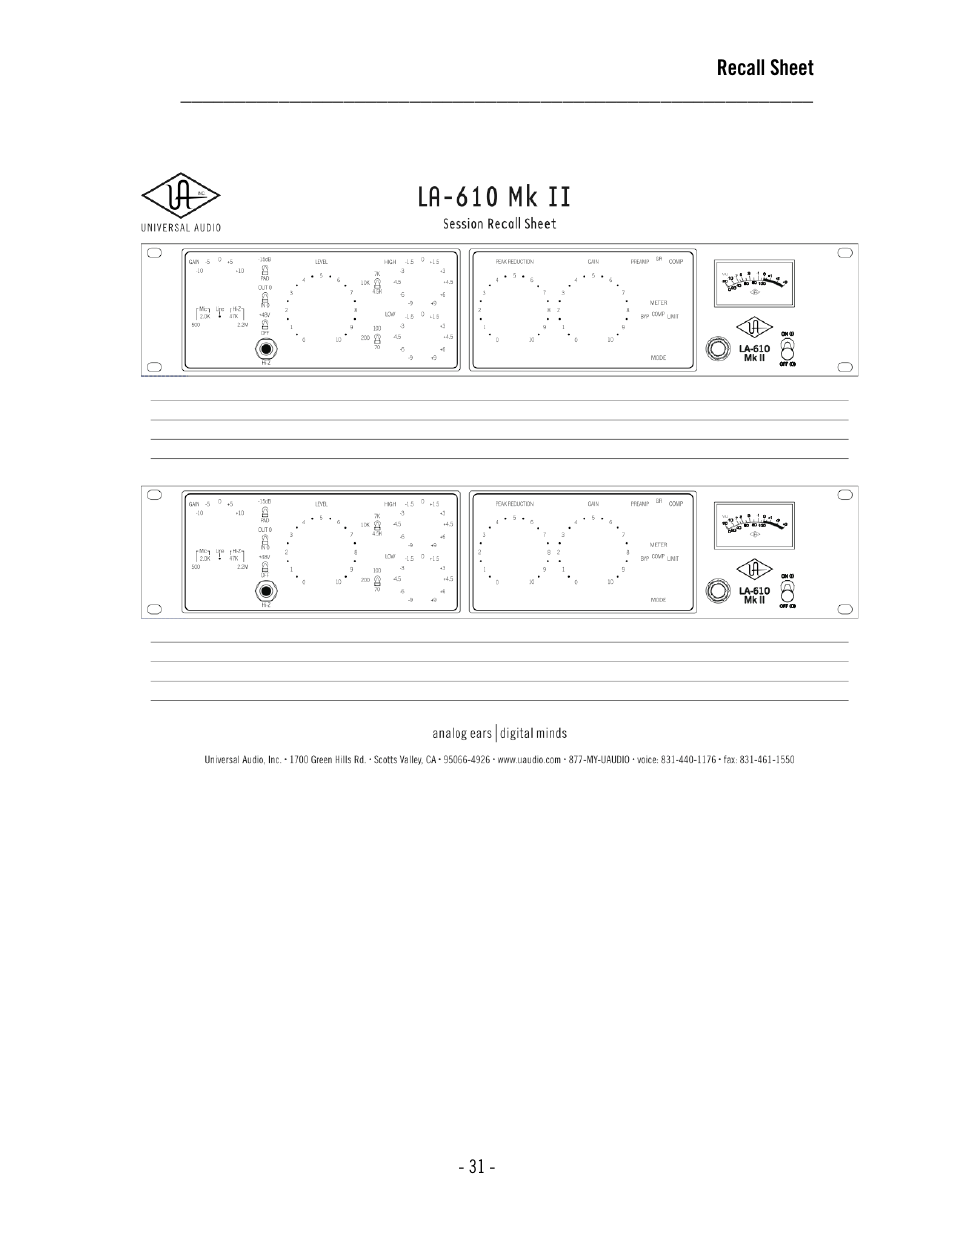 Universal Audio LA-610 Mk II User Manual | Page 35 / 37